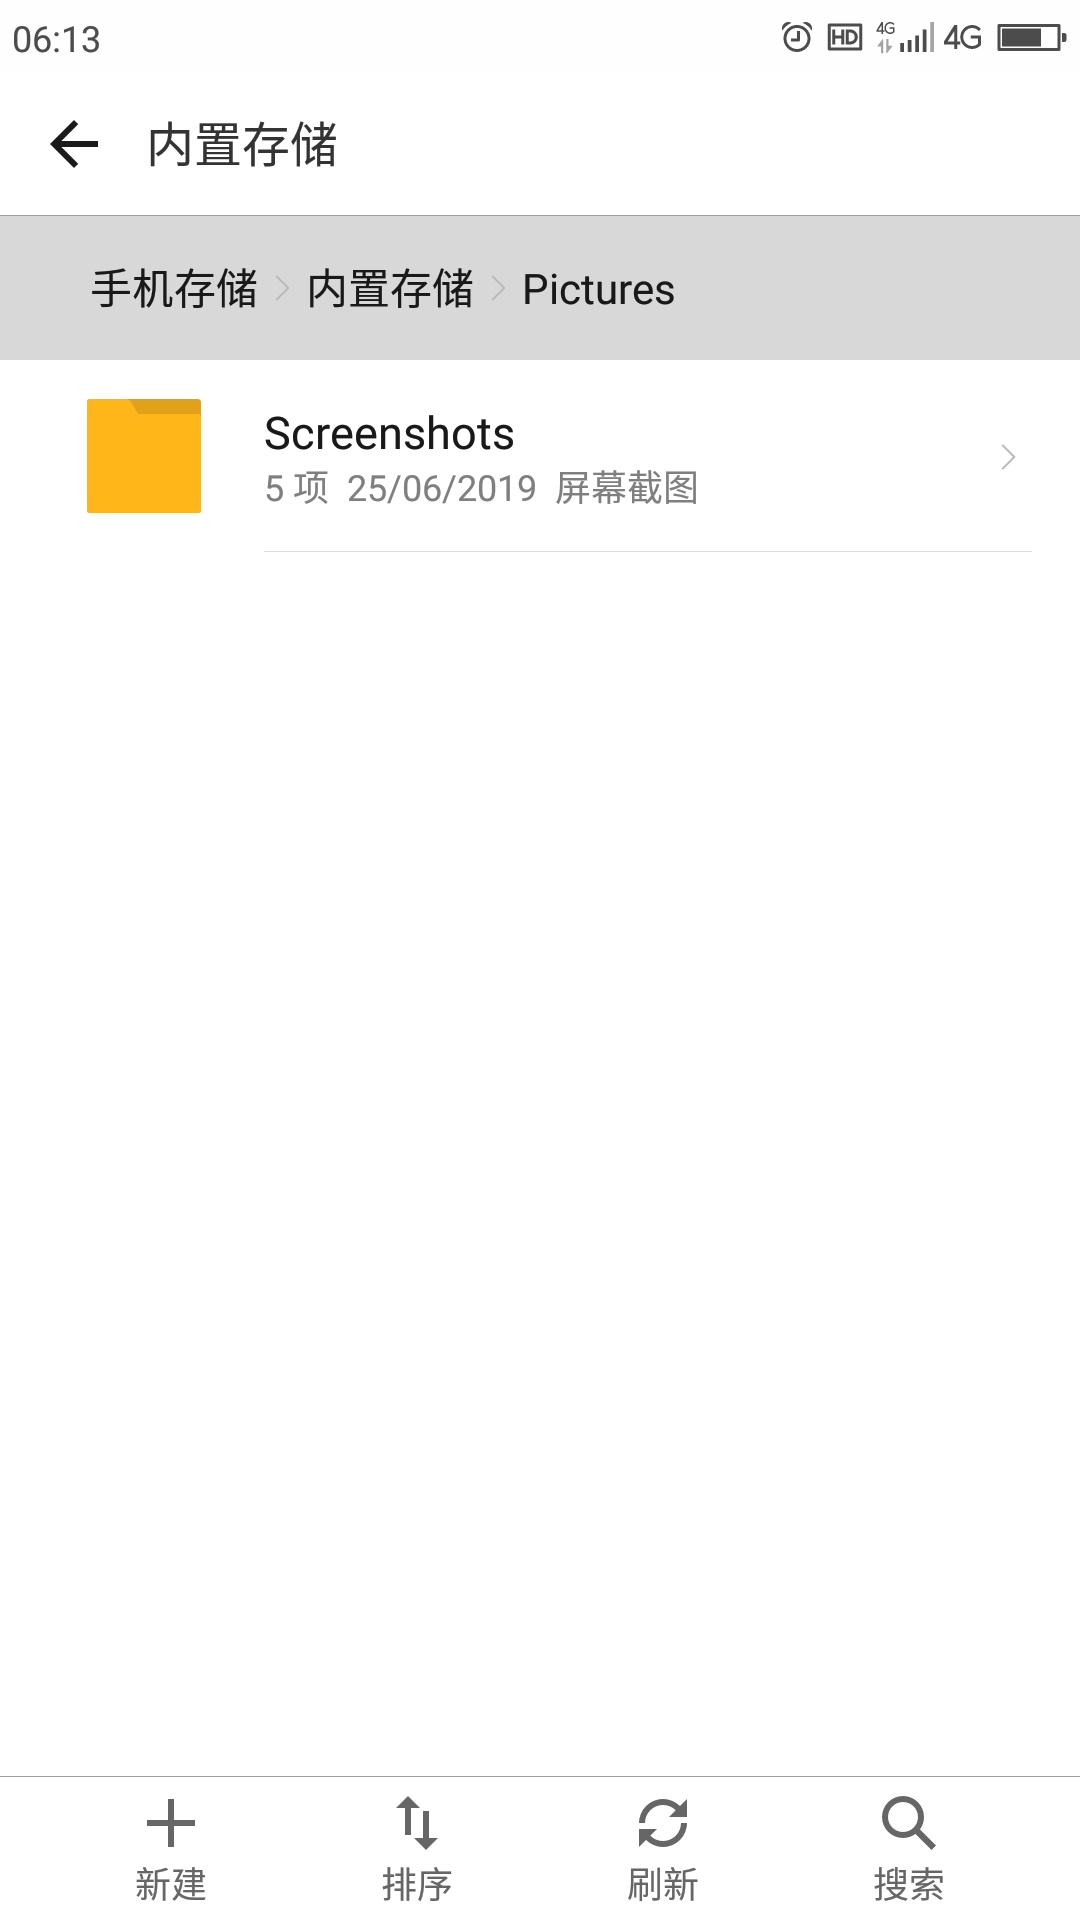 Screenshot_2019-06-27-06-13-33.png